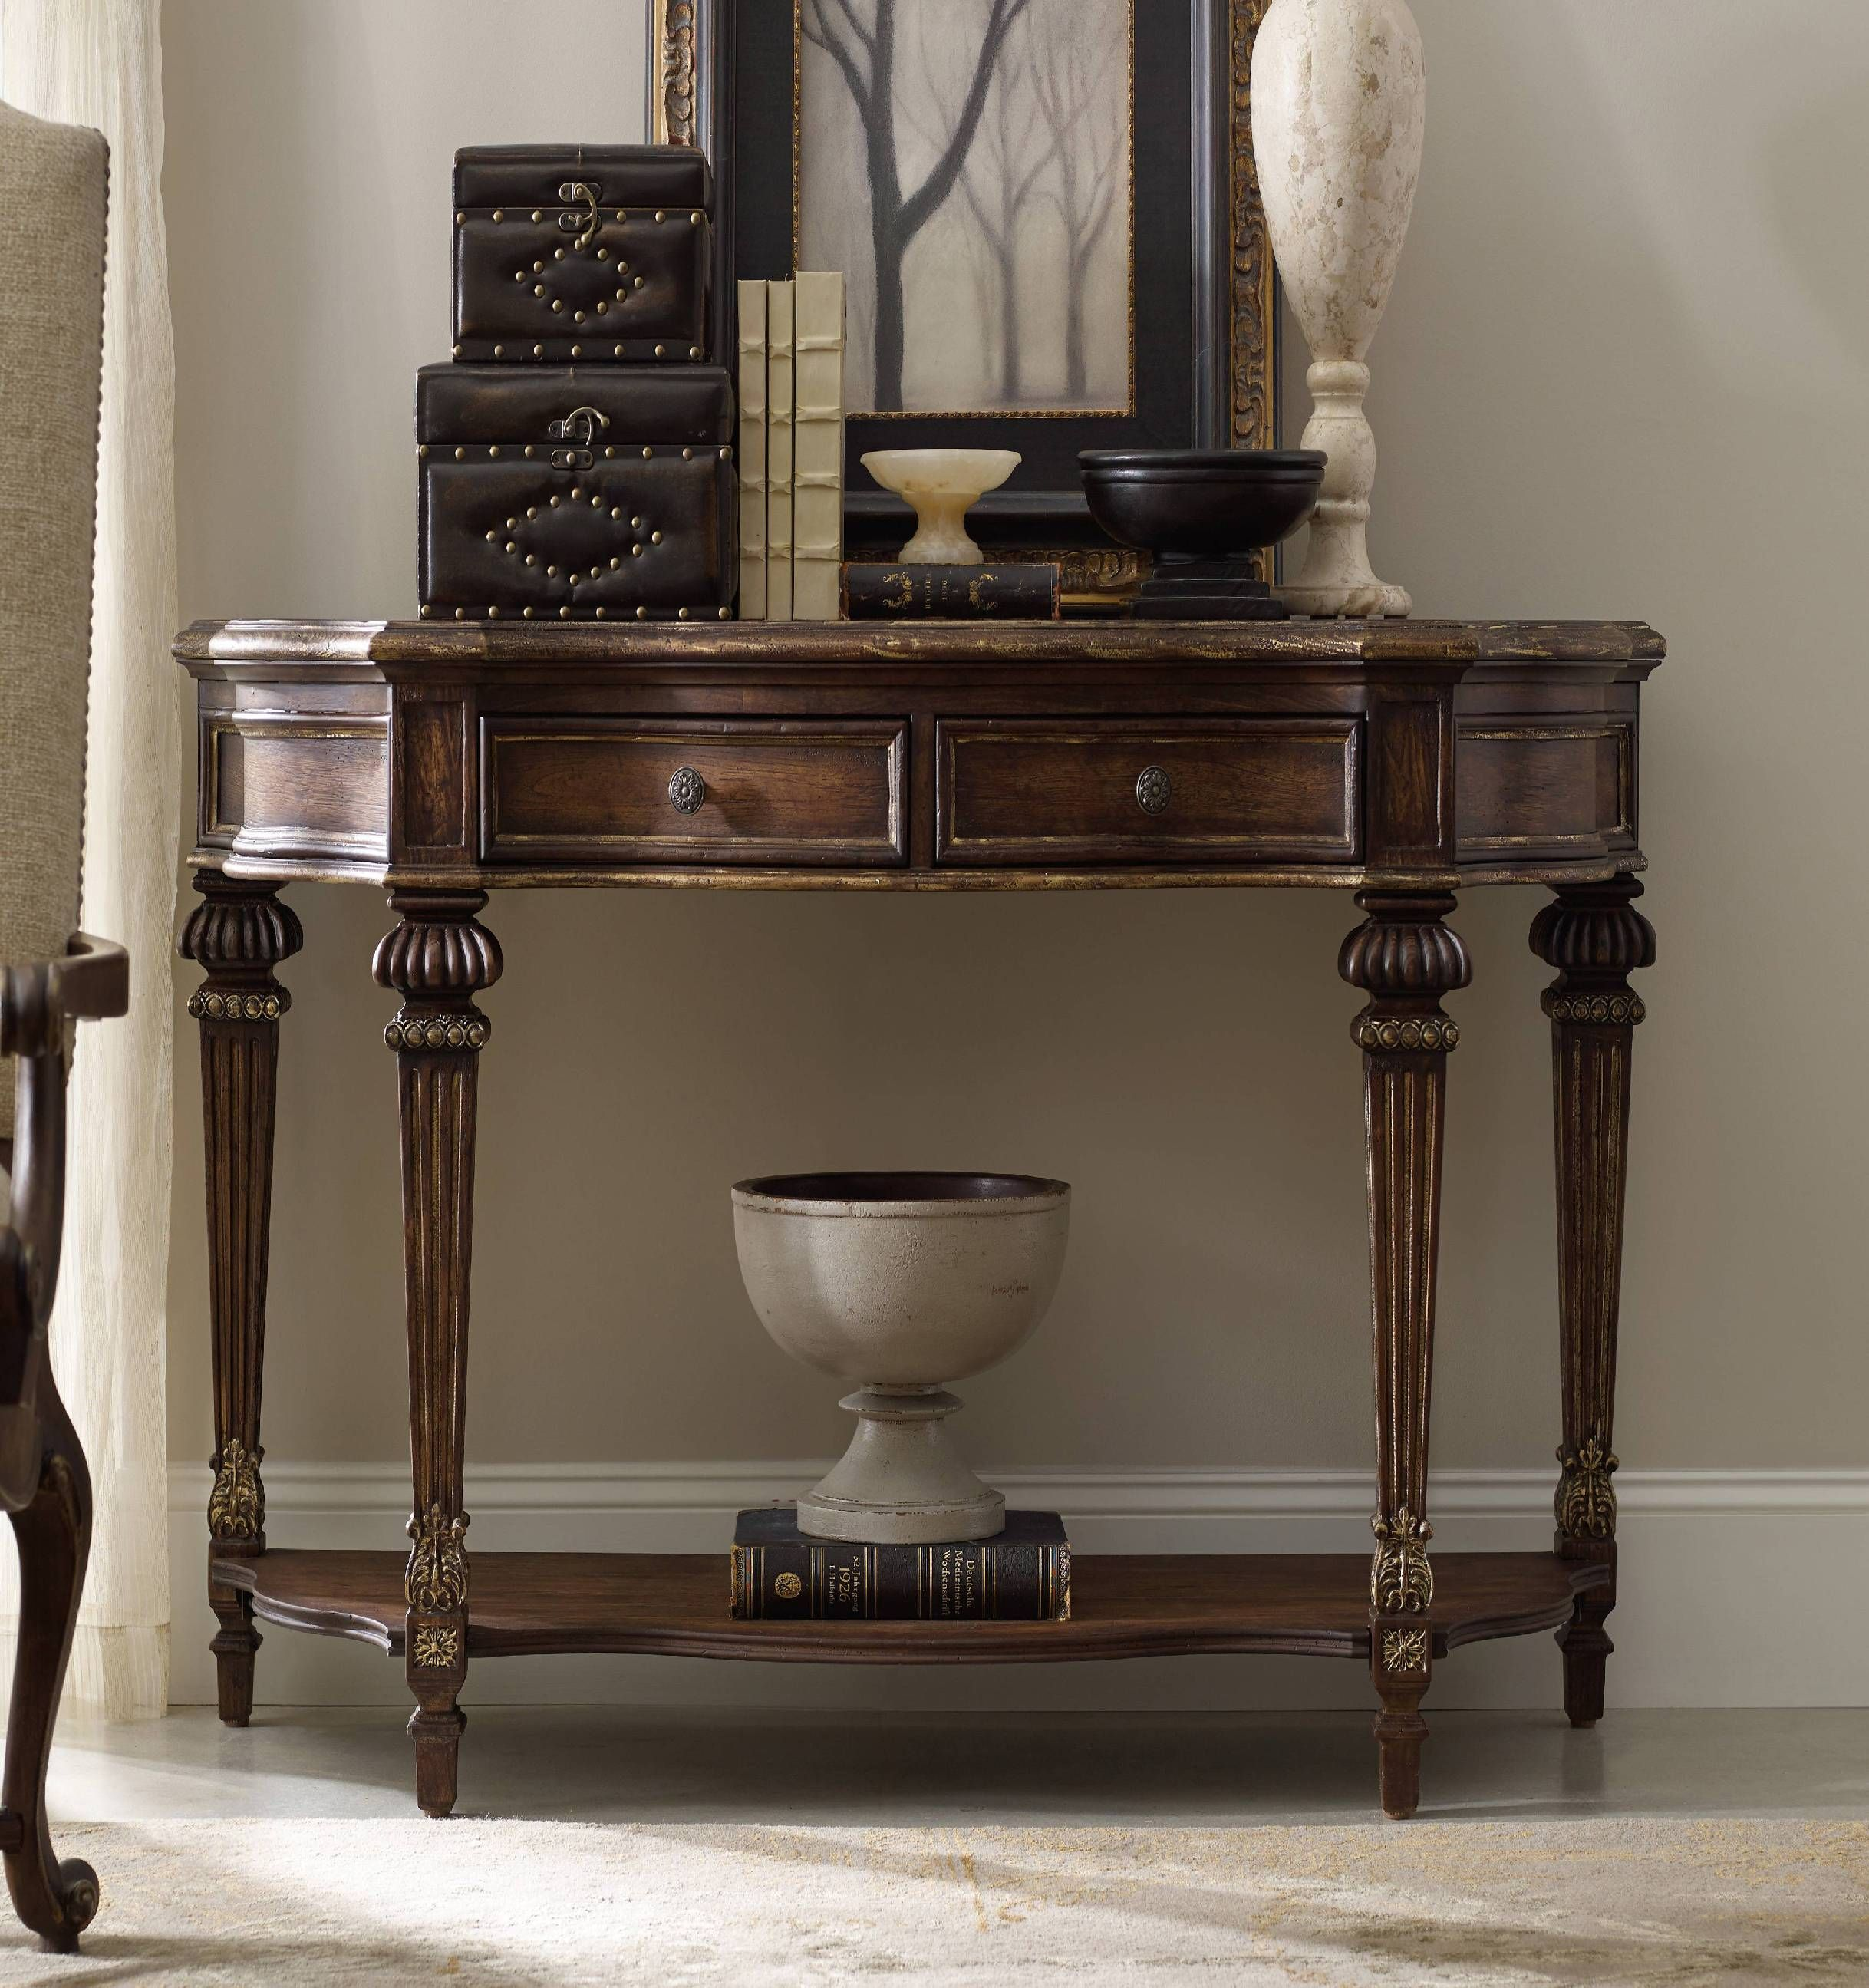 Hooker Furniture Living Room Adagio Console Table 5091 80151   Grossman  Furniture   Philadelphia,